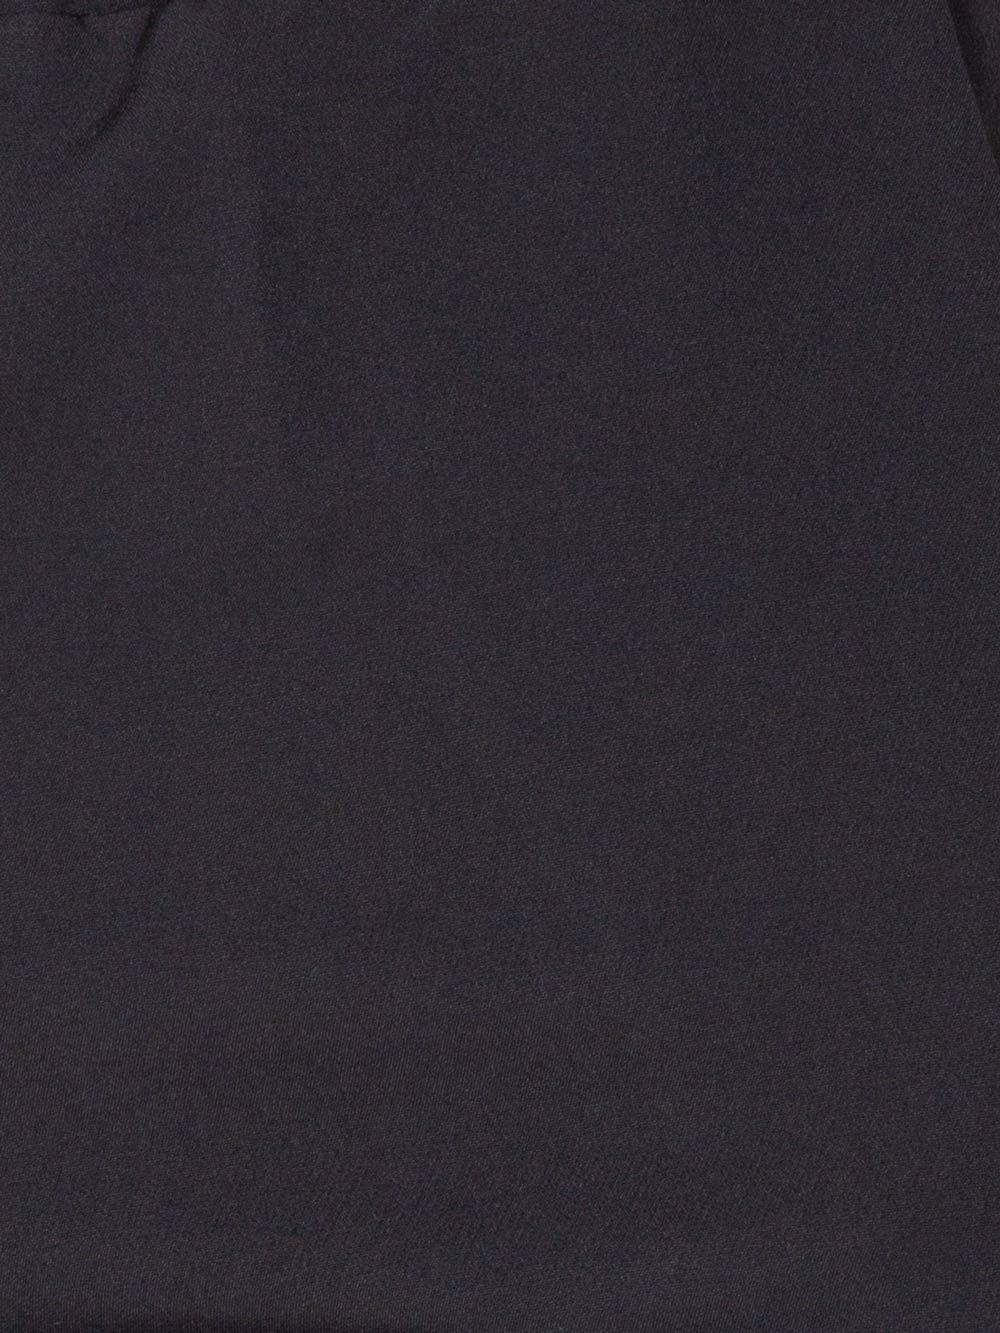 Woman wide leg elastic waist trousers Black